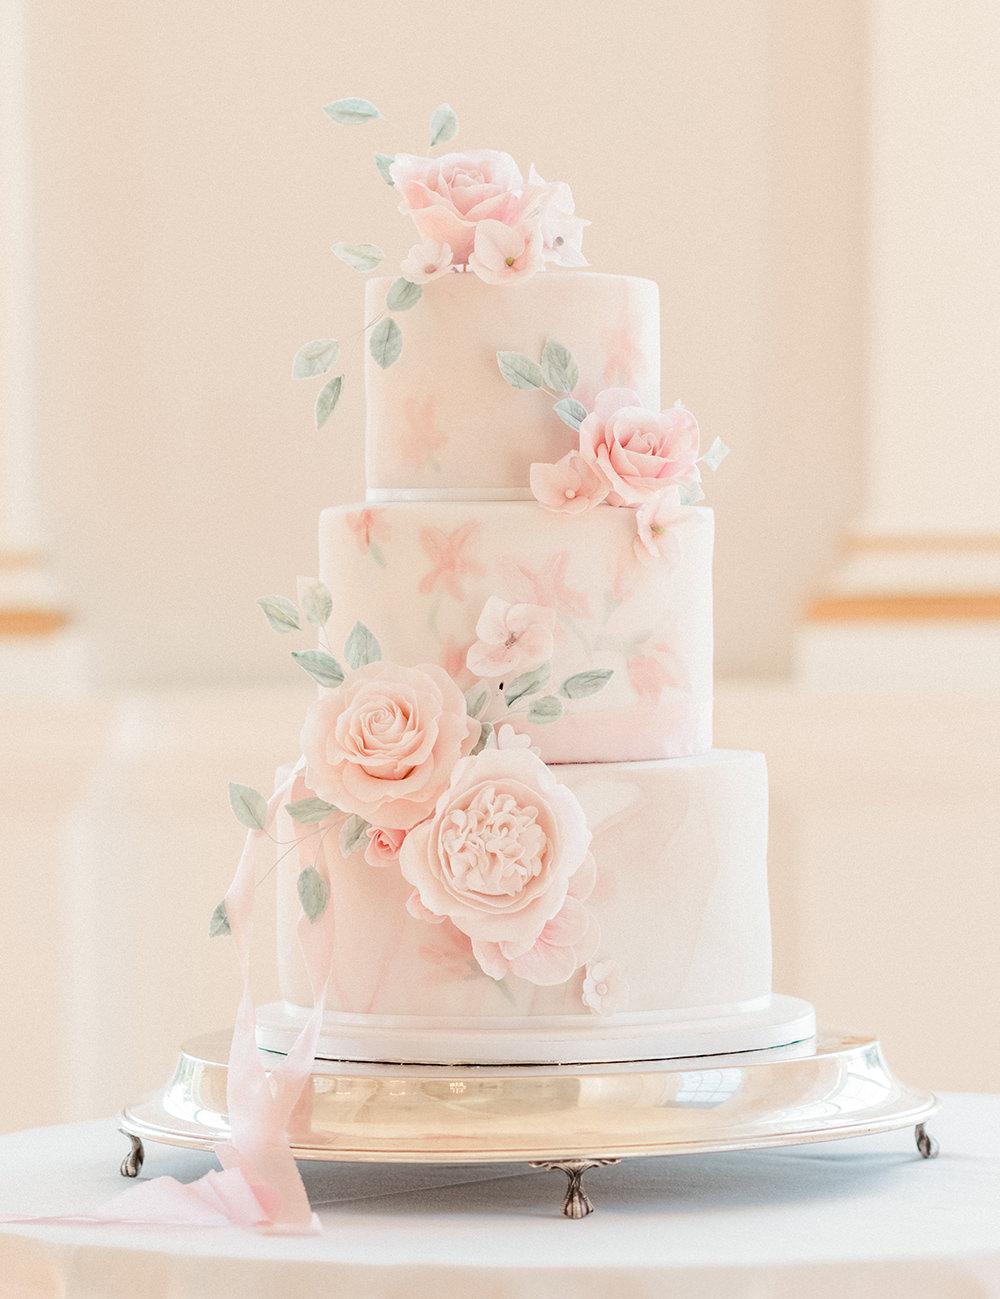 Iced Cake Sugar Flowers Pink Greenery Beamish Hall Wedding Carn Patrick Photography